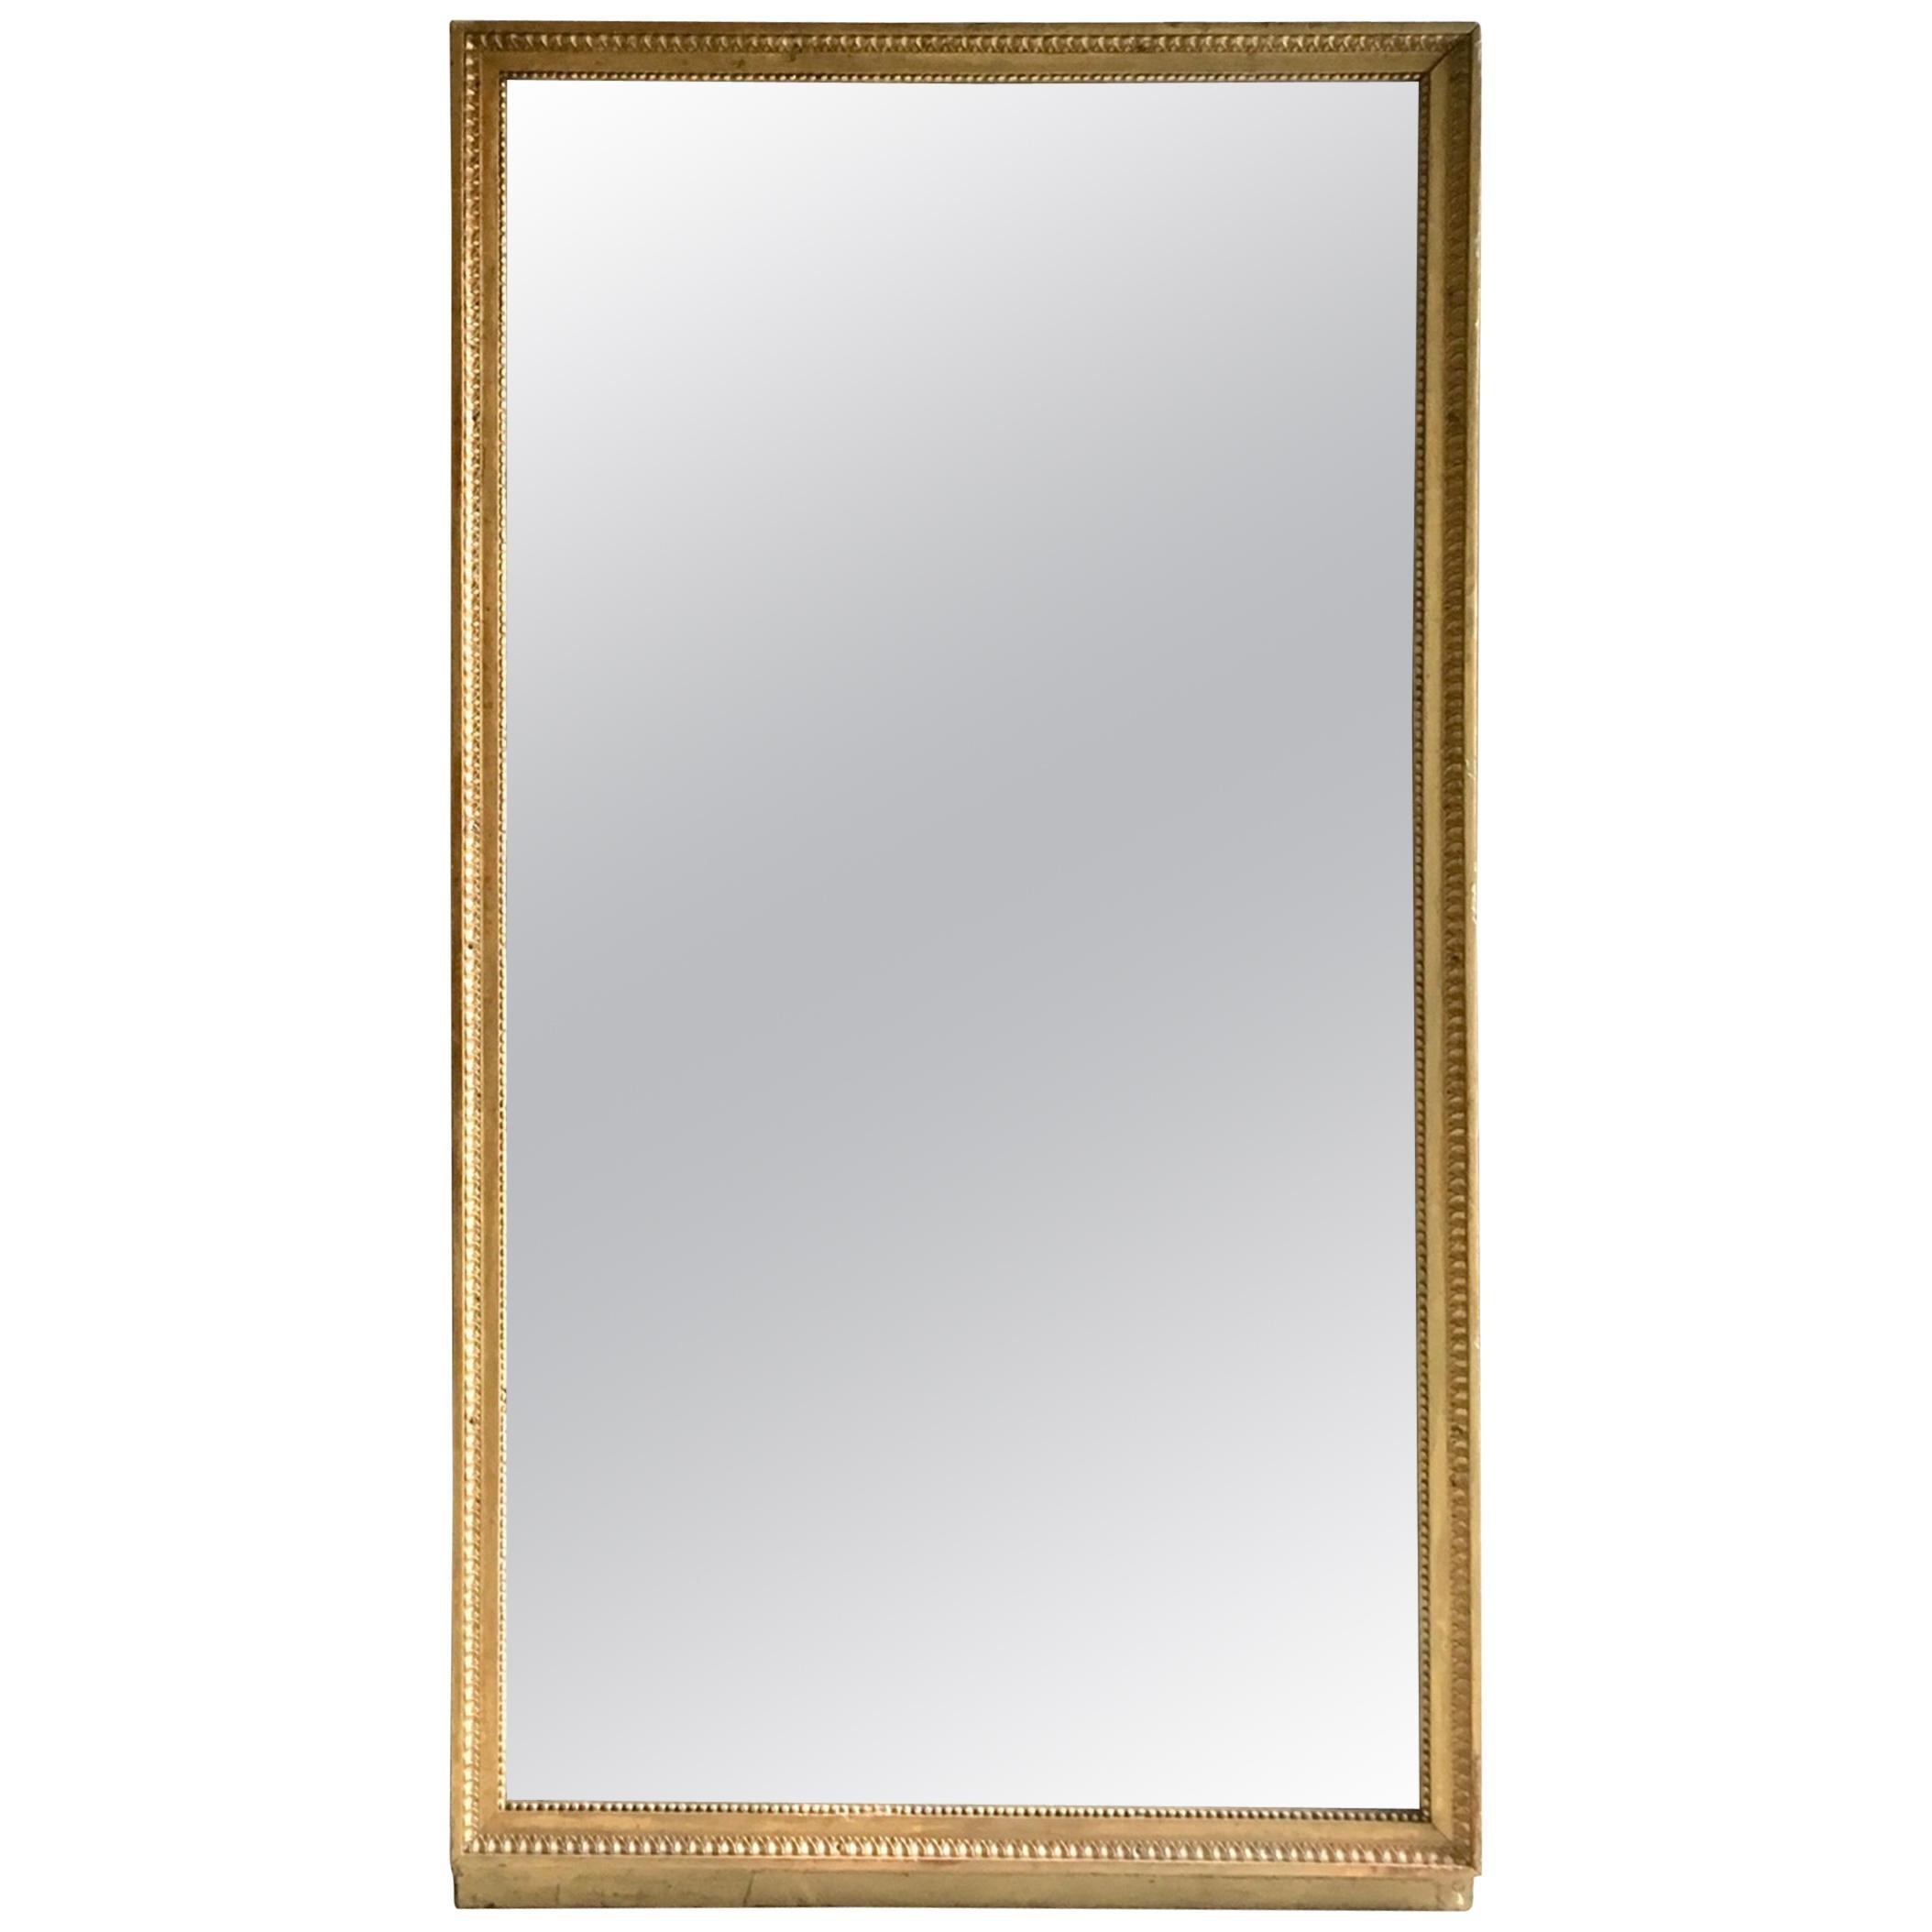 19th Century Large French Louis XVI Giltwood Mirror